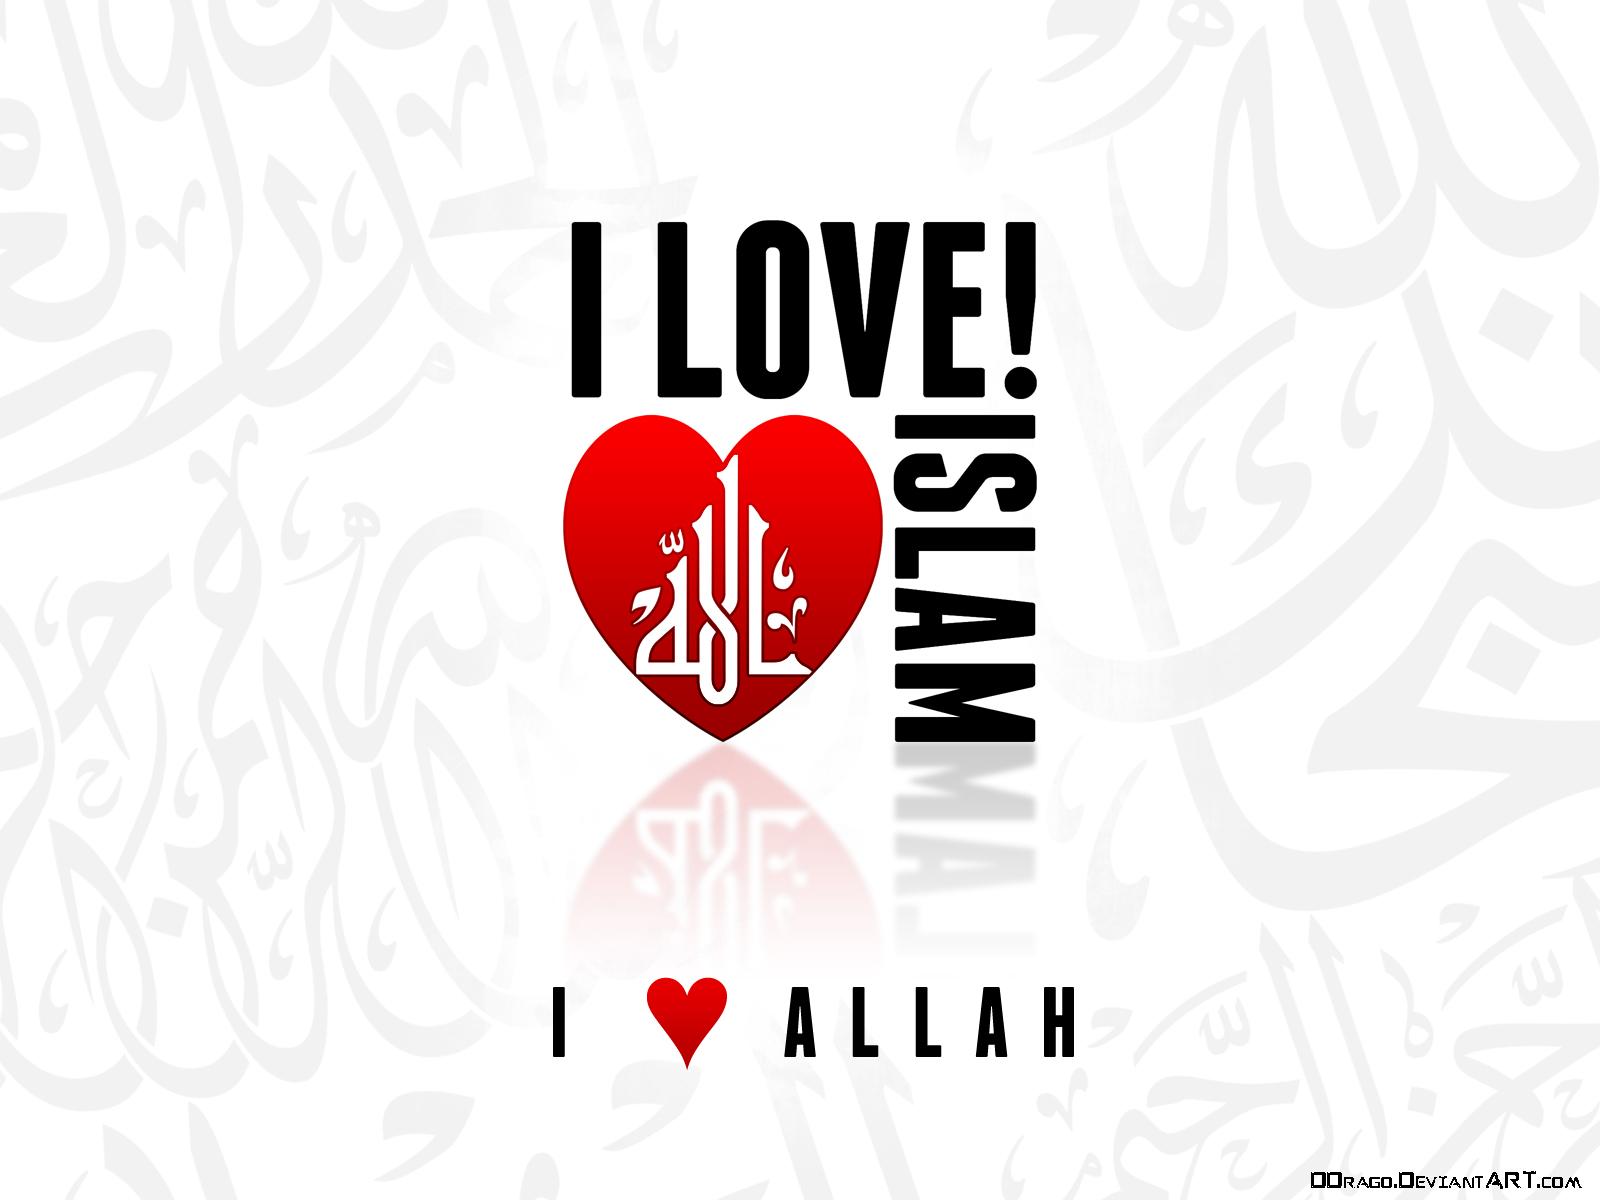 Best Reminder Ramadan Wallpaper - islamic-wallpapers-islamic-art-Ramadan%2BWallpapers%2B2010%252C%2BIslamic%2BRamzan%2BDesktop%2BBackgrounds%2BSports%2BCar%2BWallpapers%2B2011%2B%2BFree%2BSports%2BCar%2BWallpapers%2B2011%2B%25C2%25B7%2BStones%2BWallpapers1%2B%25287%2529  Picture_984480 .jpg